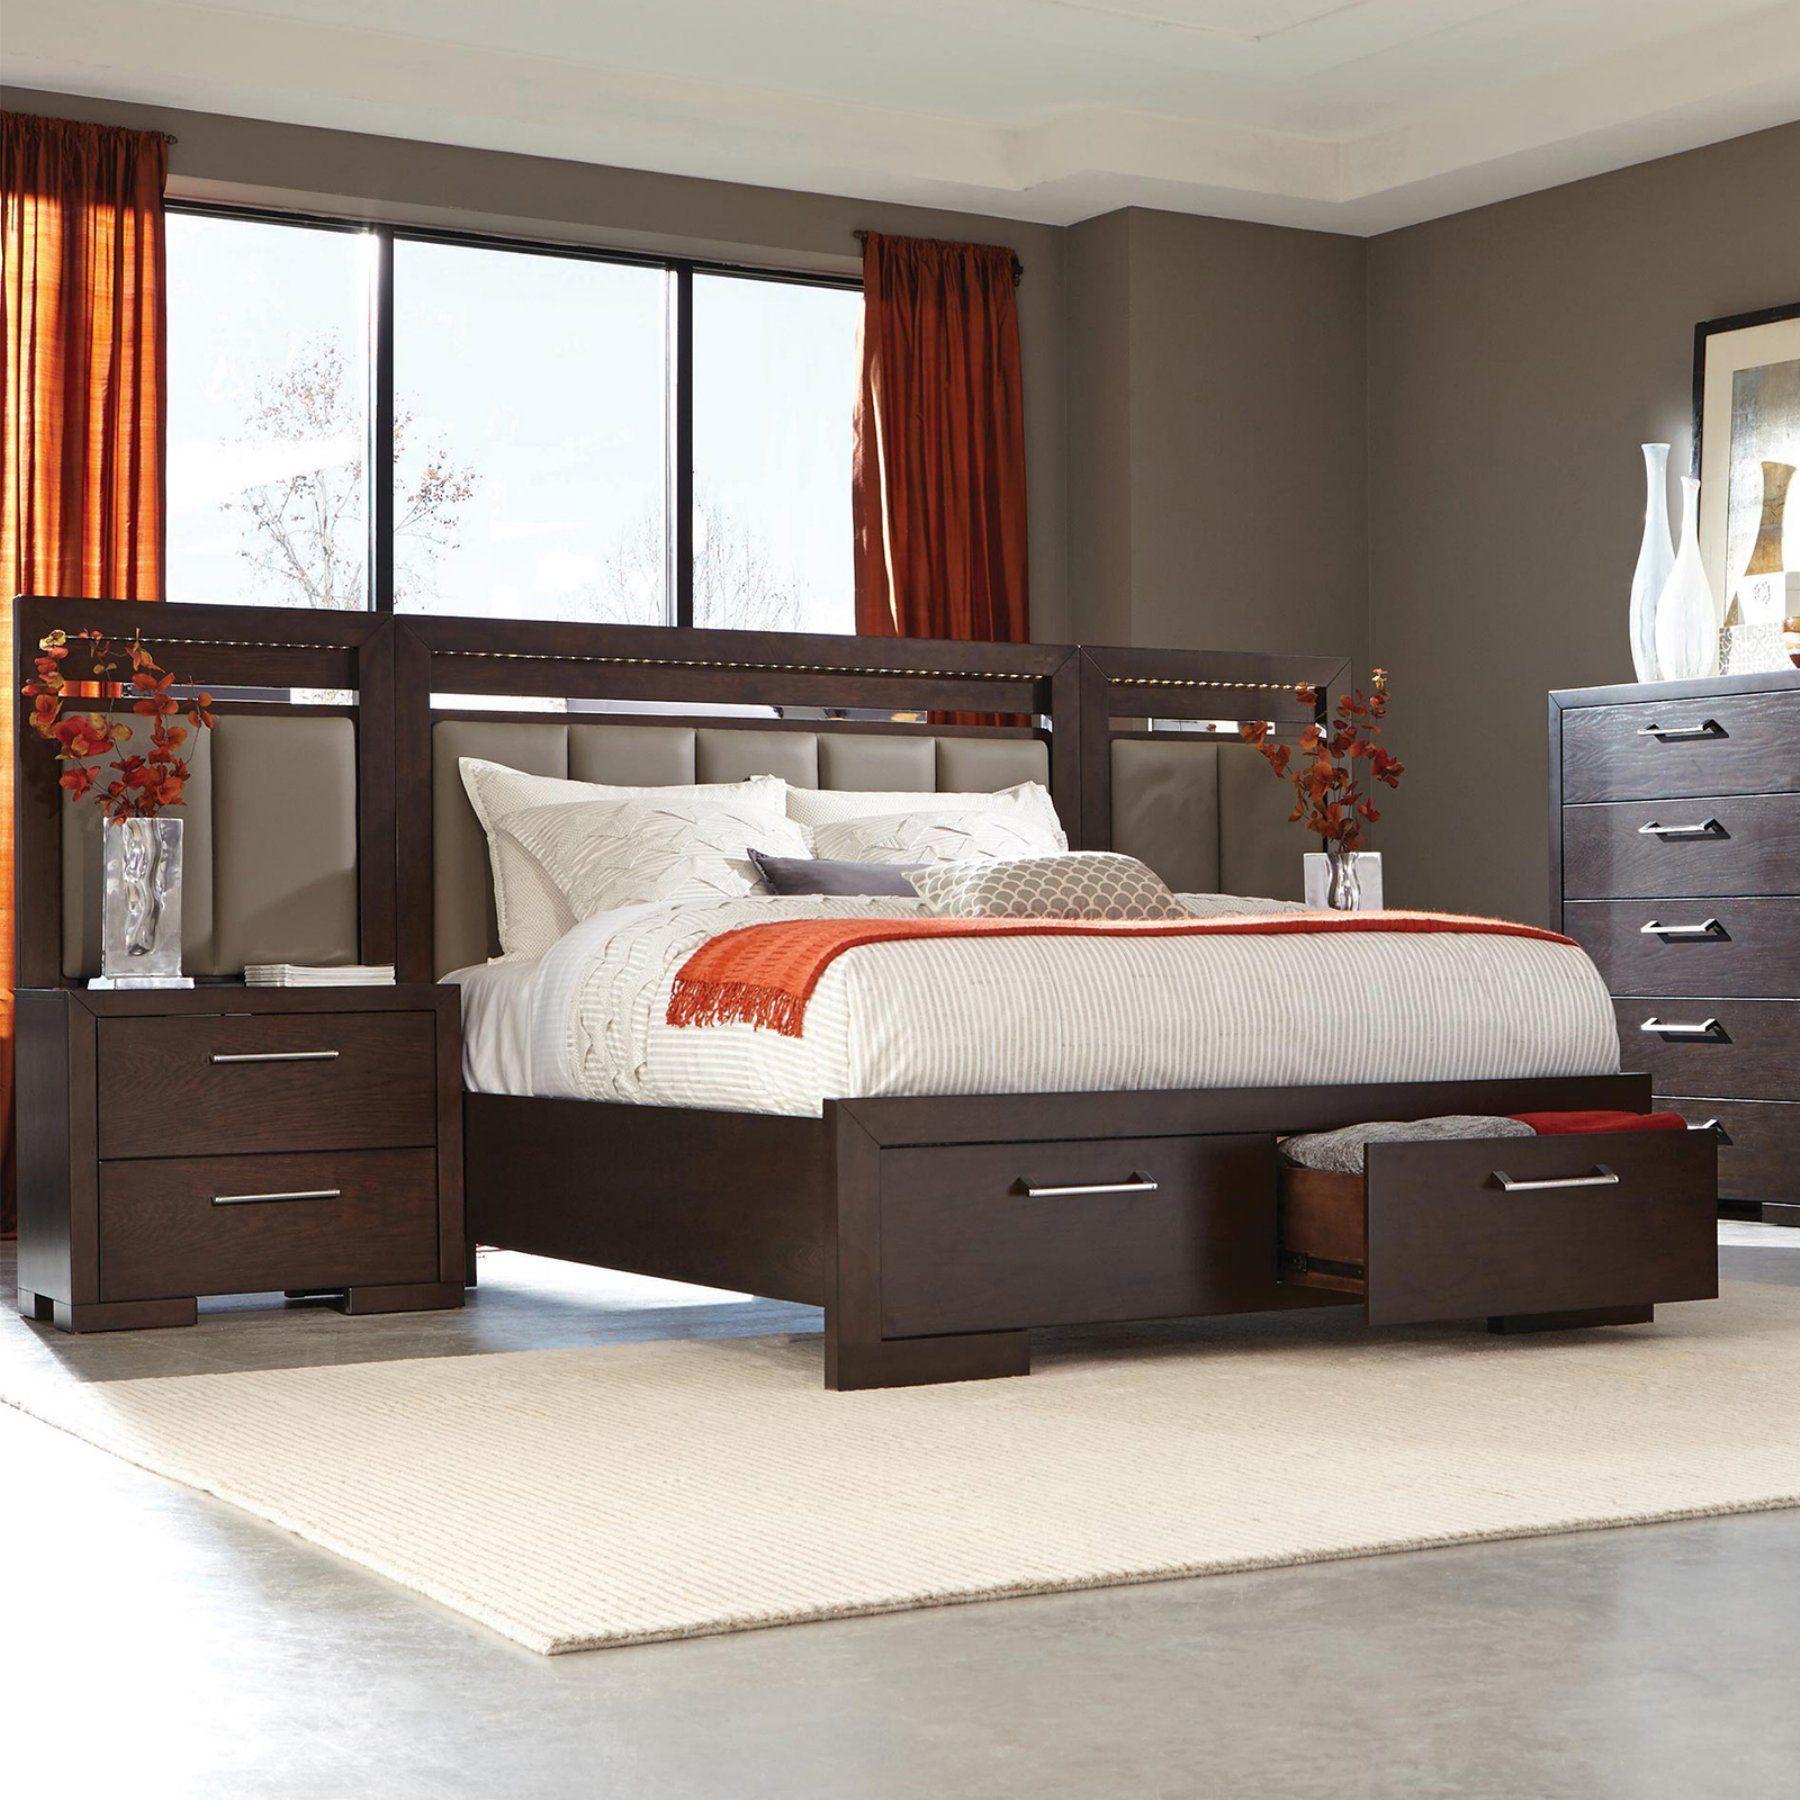 Coaster Furniture Berkshire Upholstered Storage Bed and